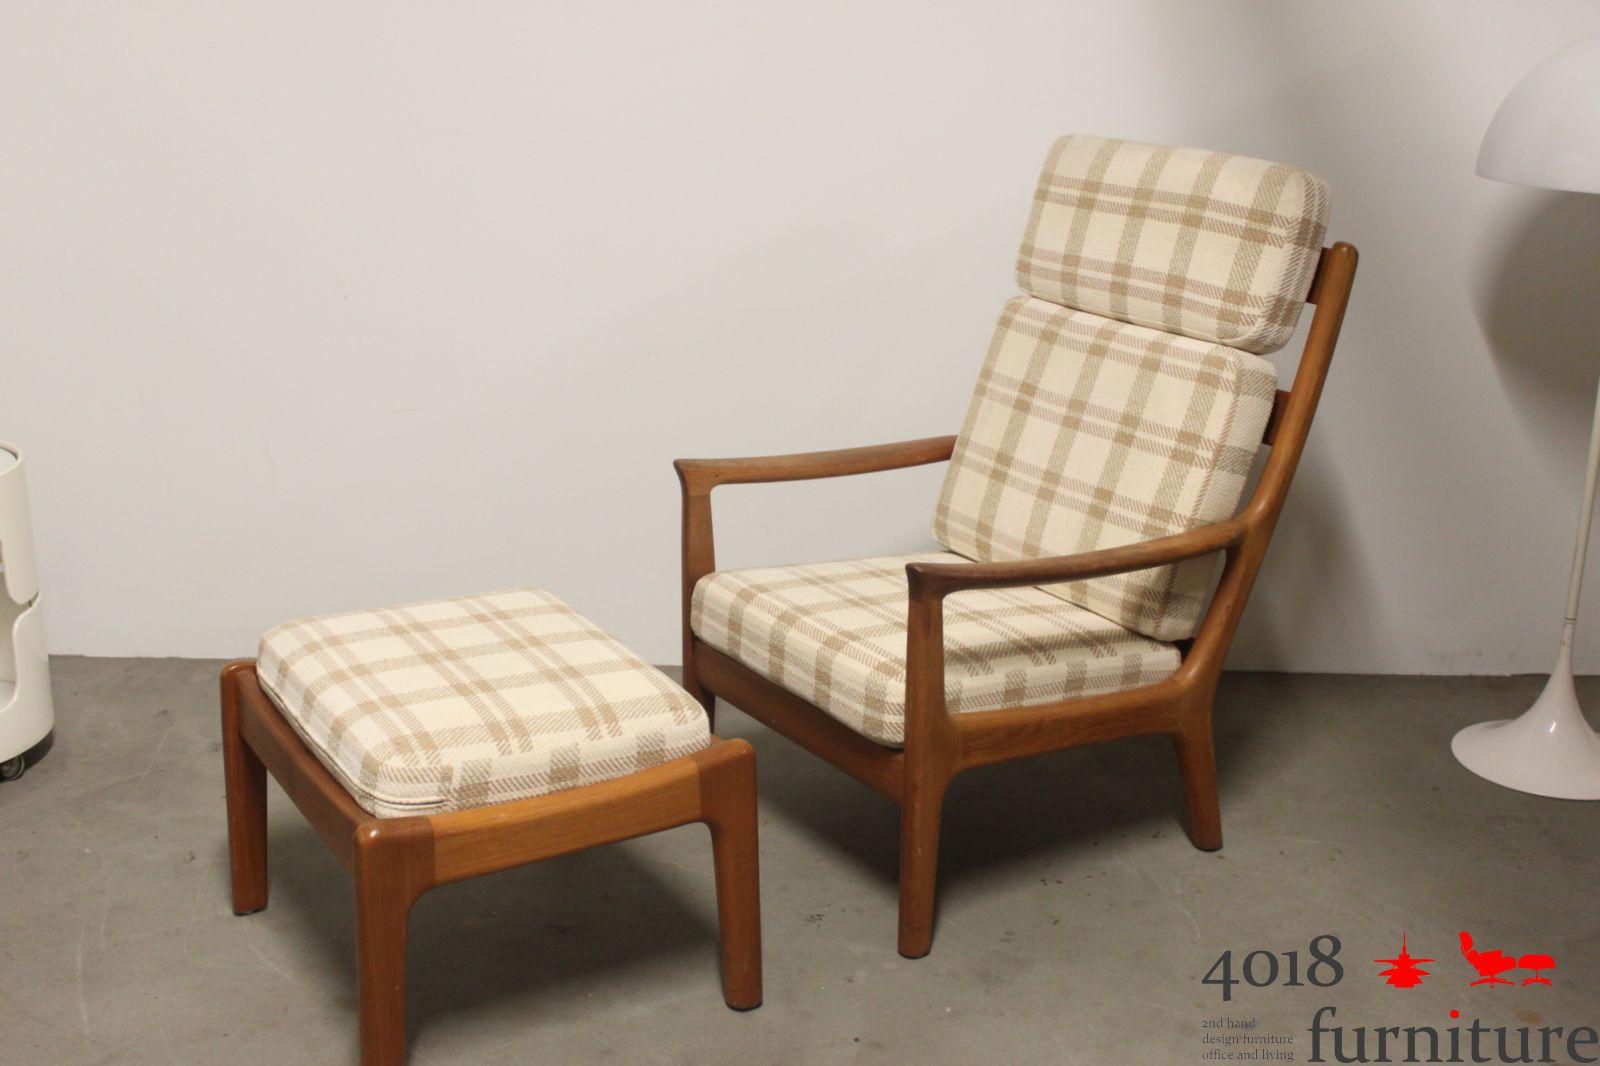 teak highback chair hochlehner sessel mit hocker danish mid century lounge chair ebay. Black Bedroom Furniture Sets. Home Design Ideas